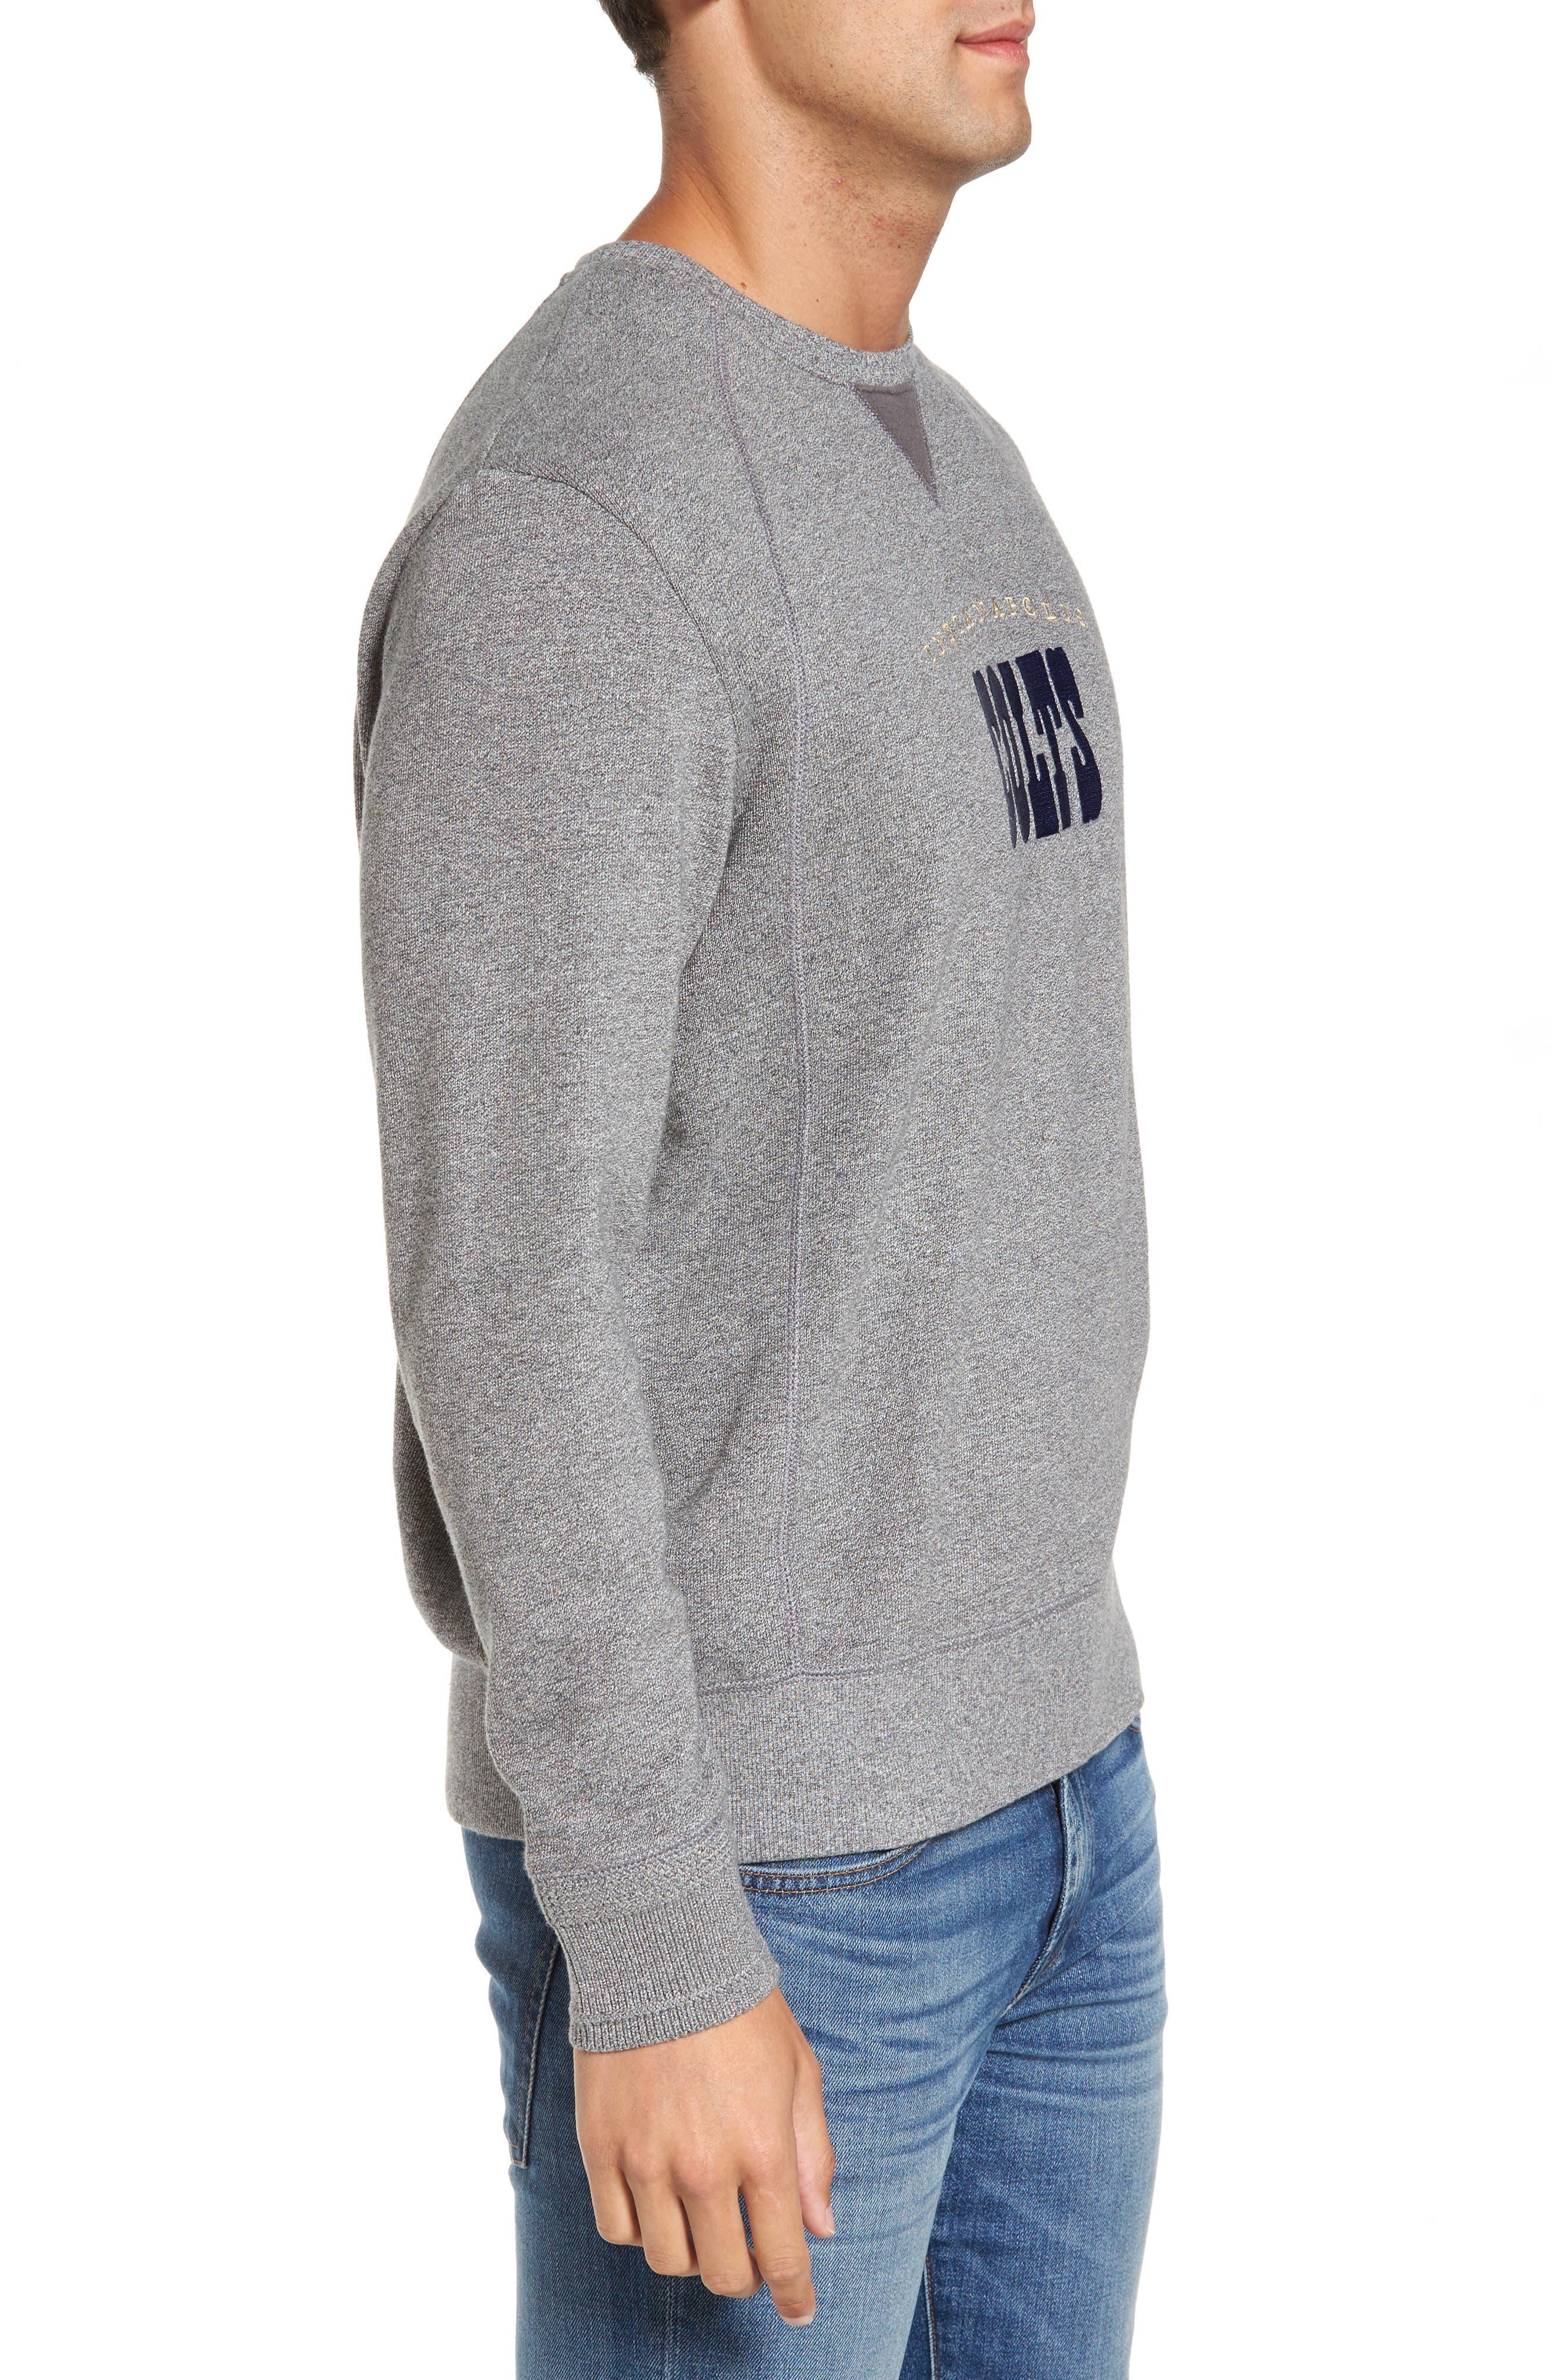 NFL Stitch of Liberty Embroidered Crewneck Sweatshirt,                             Alternate thumbnail 73, color,